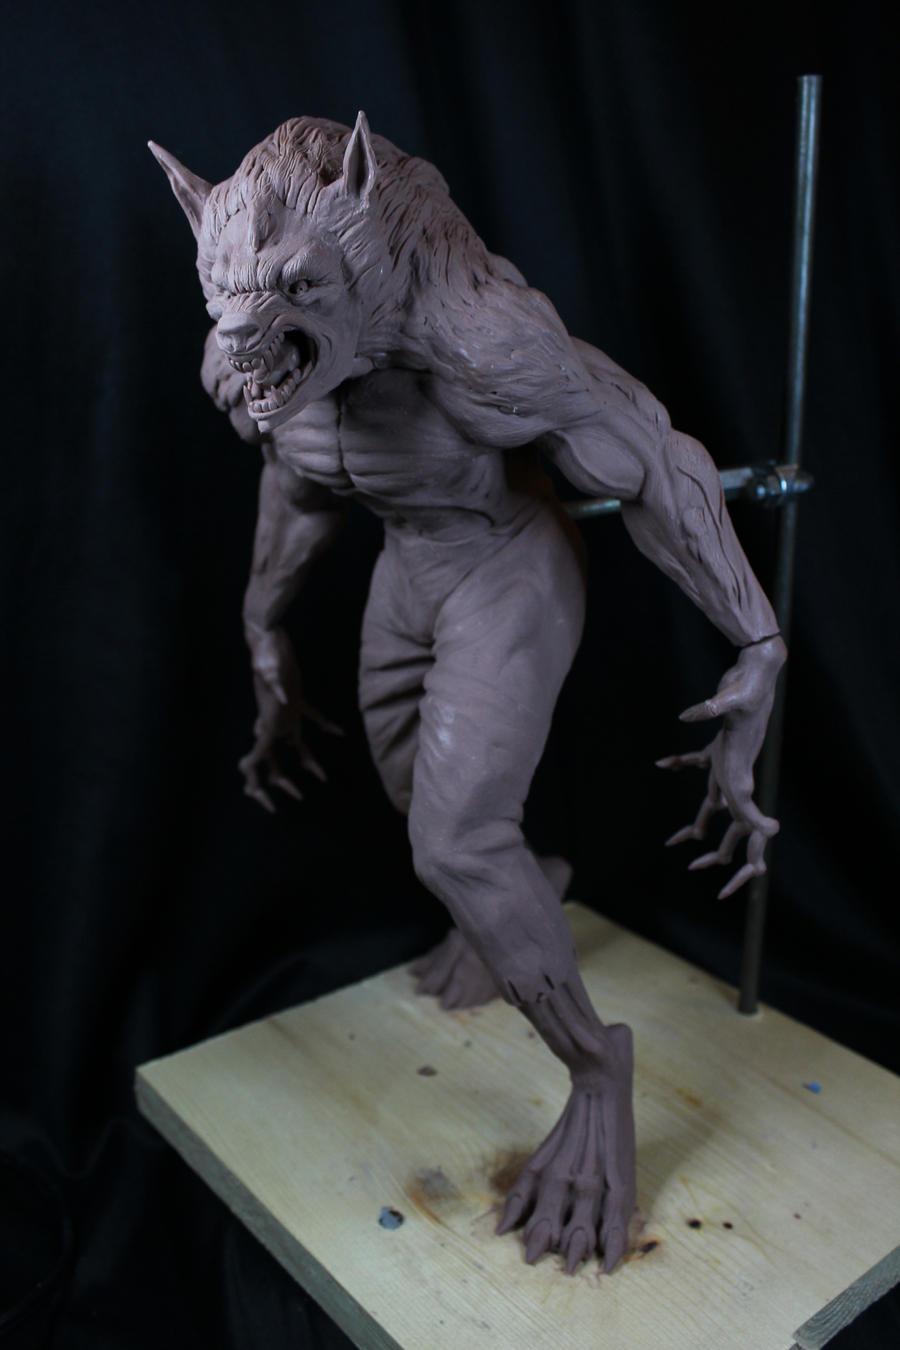 Werewolf WIP by Blairsculpture